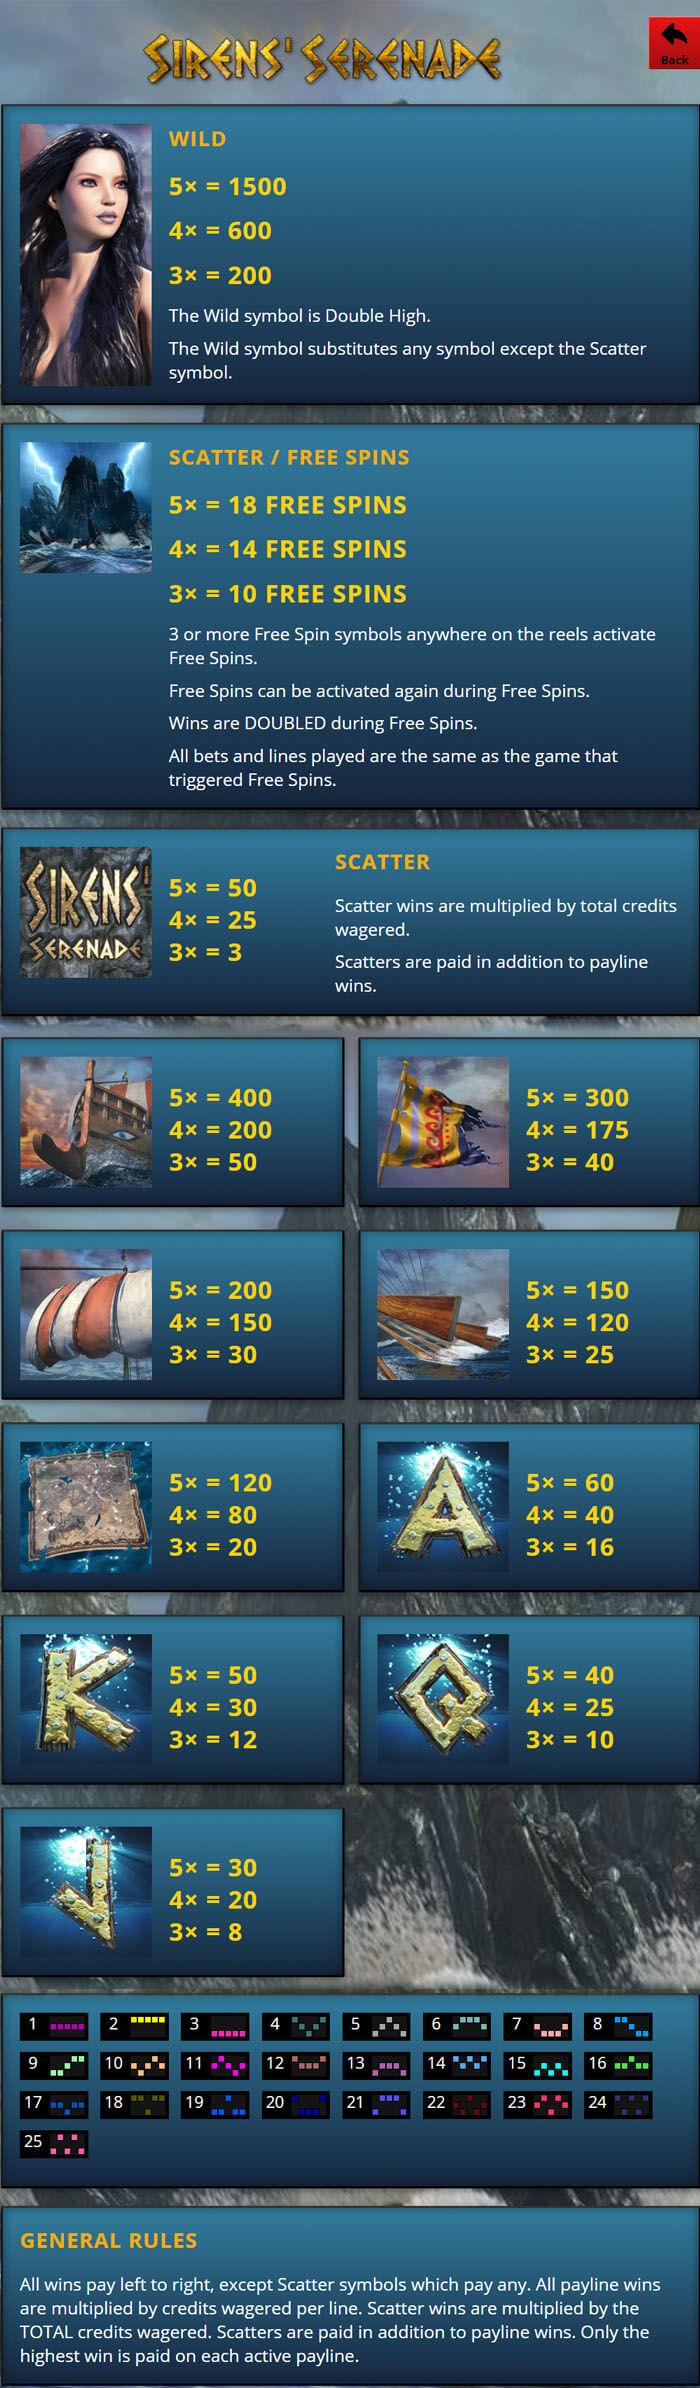 Sirens Serenade Pay Table Screenshot, Treasure Mile